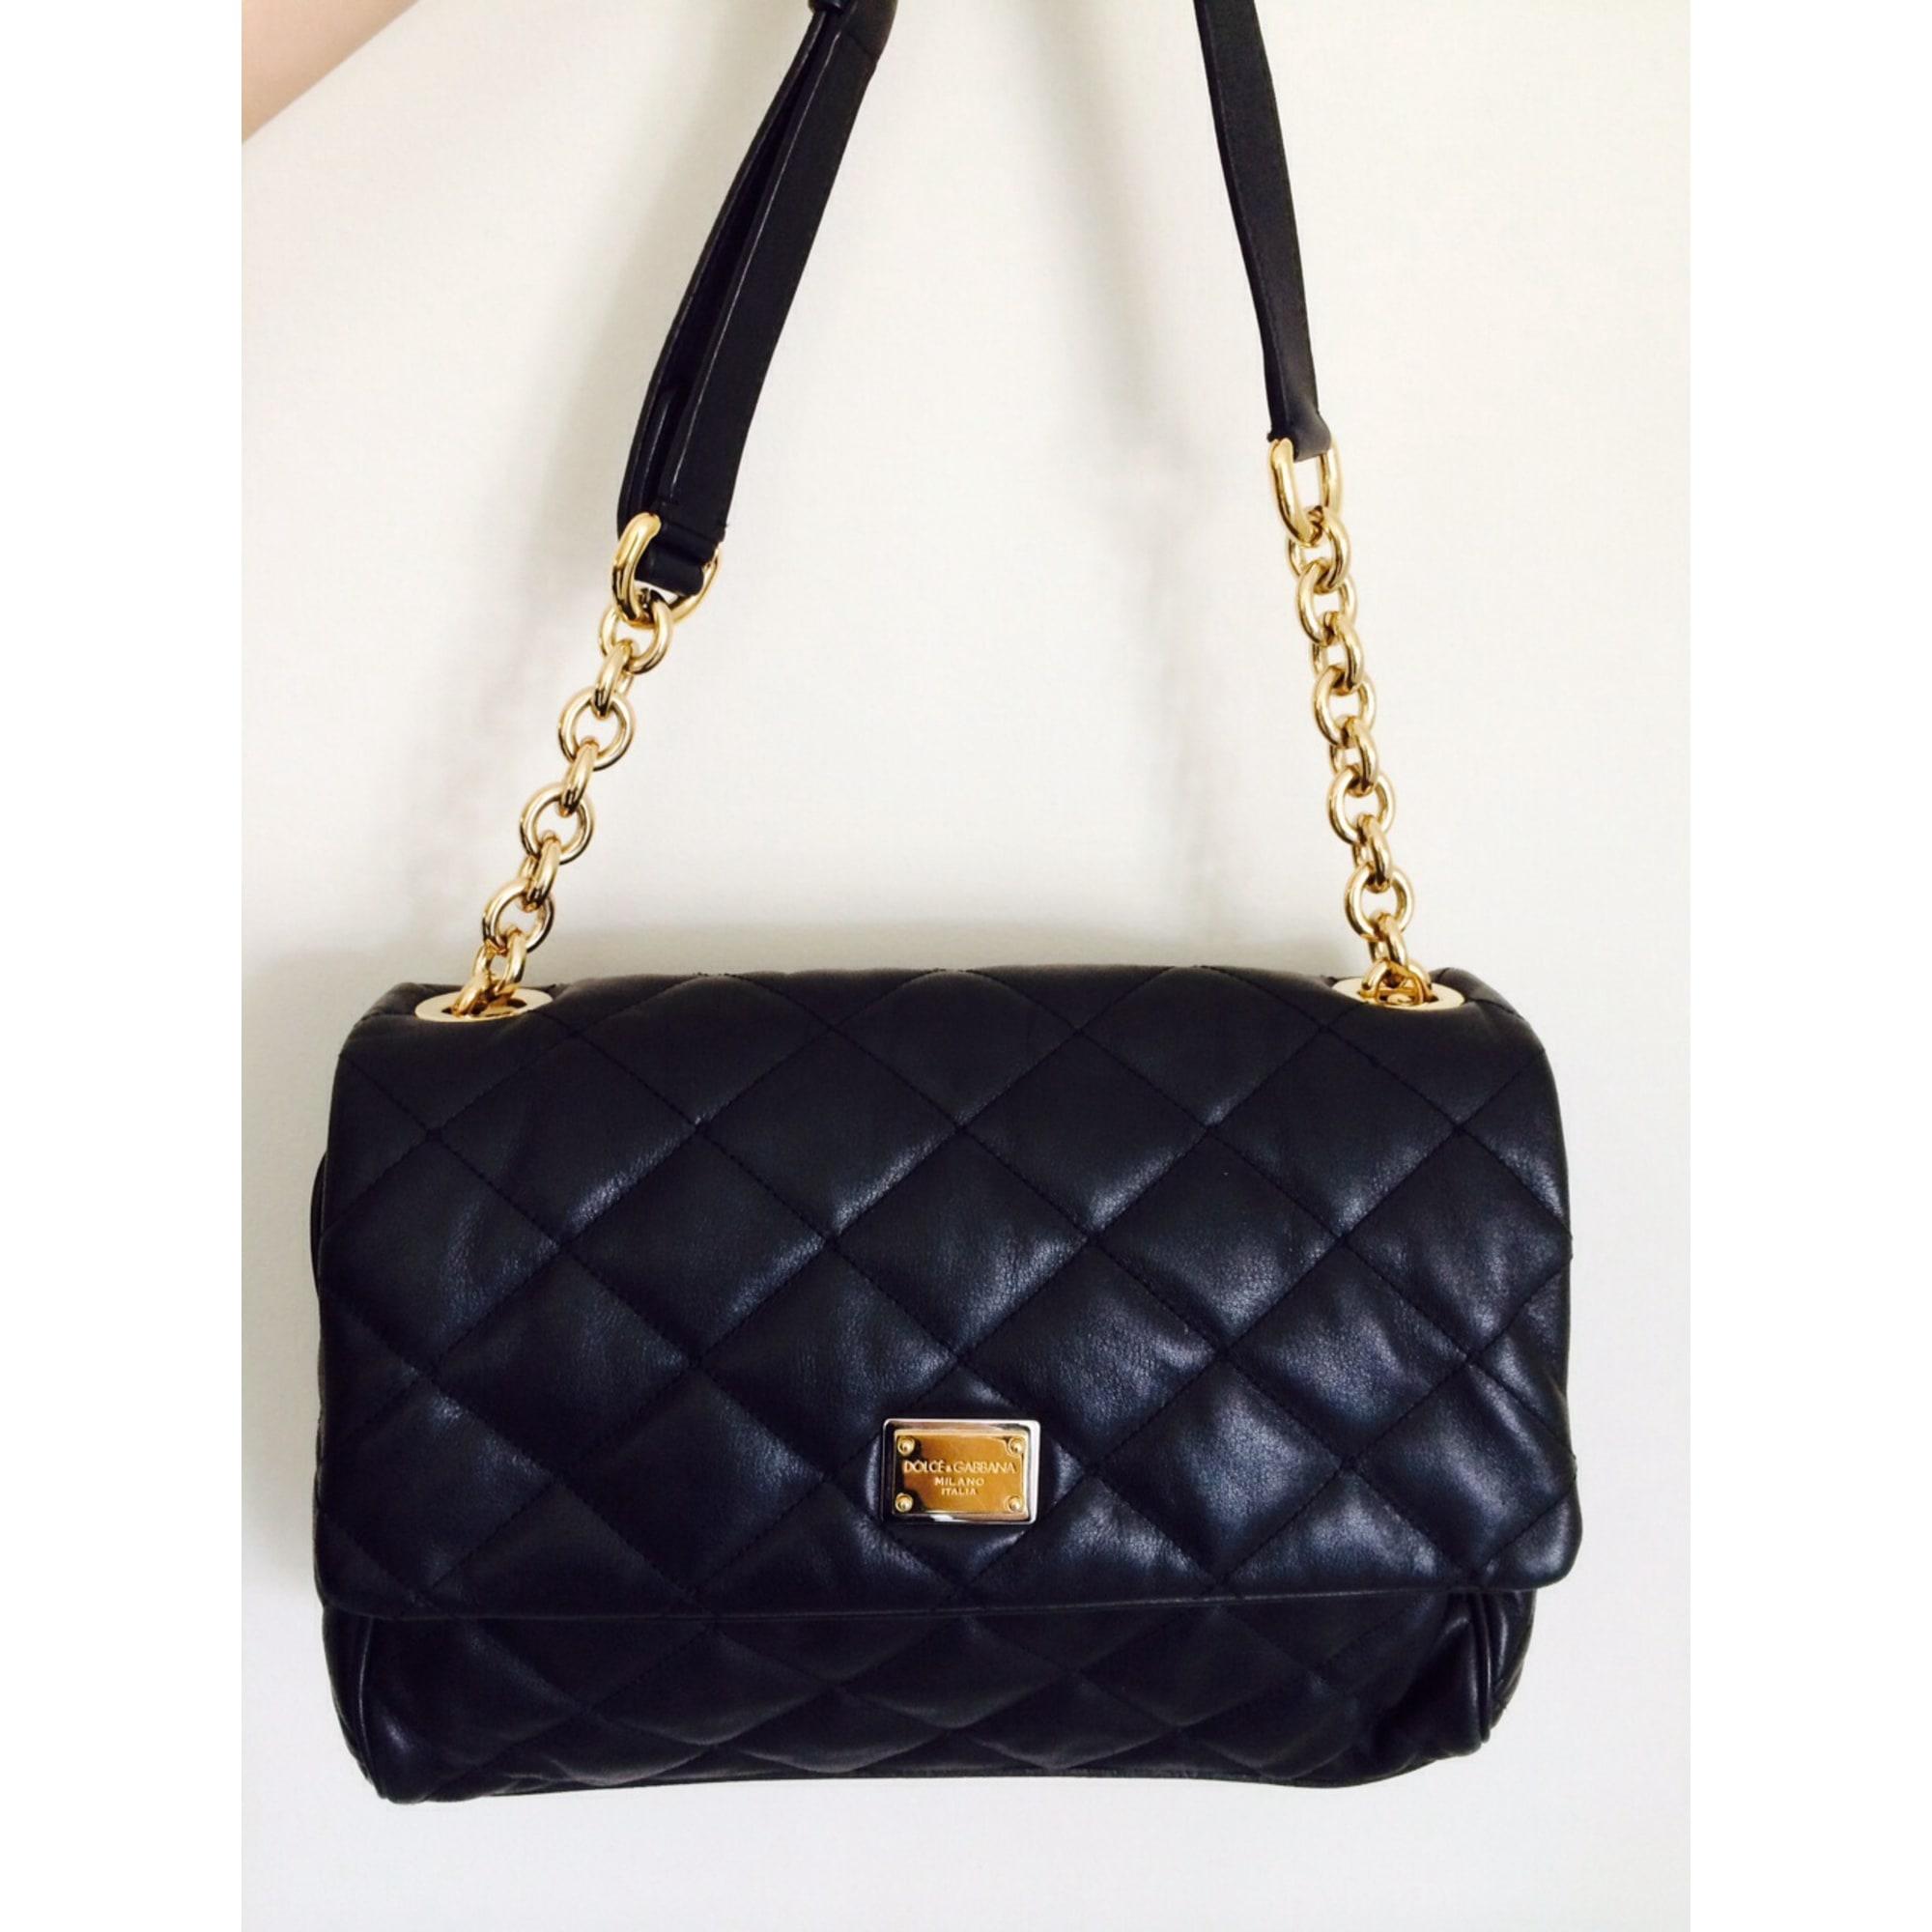 Vendu Par Noir Cuir Sac Parislondon Main Dolceamp; Gabbana À En NwOvm8n0